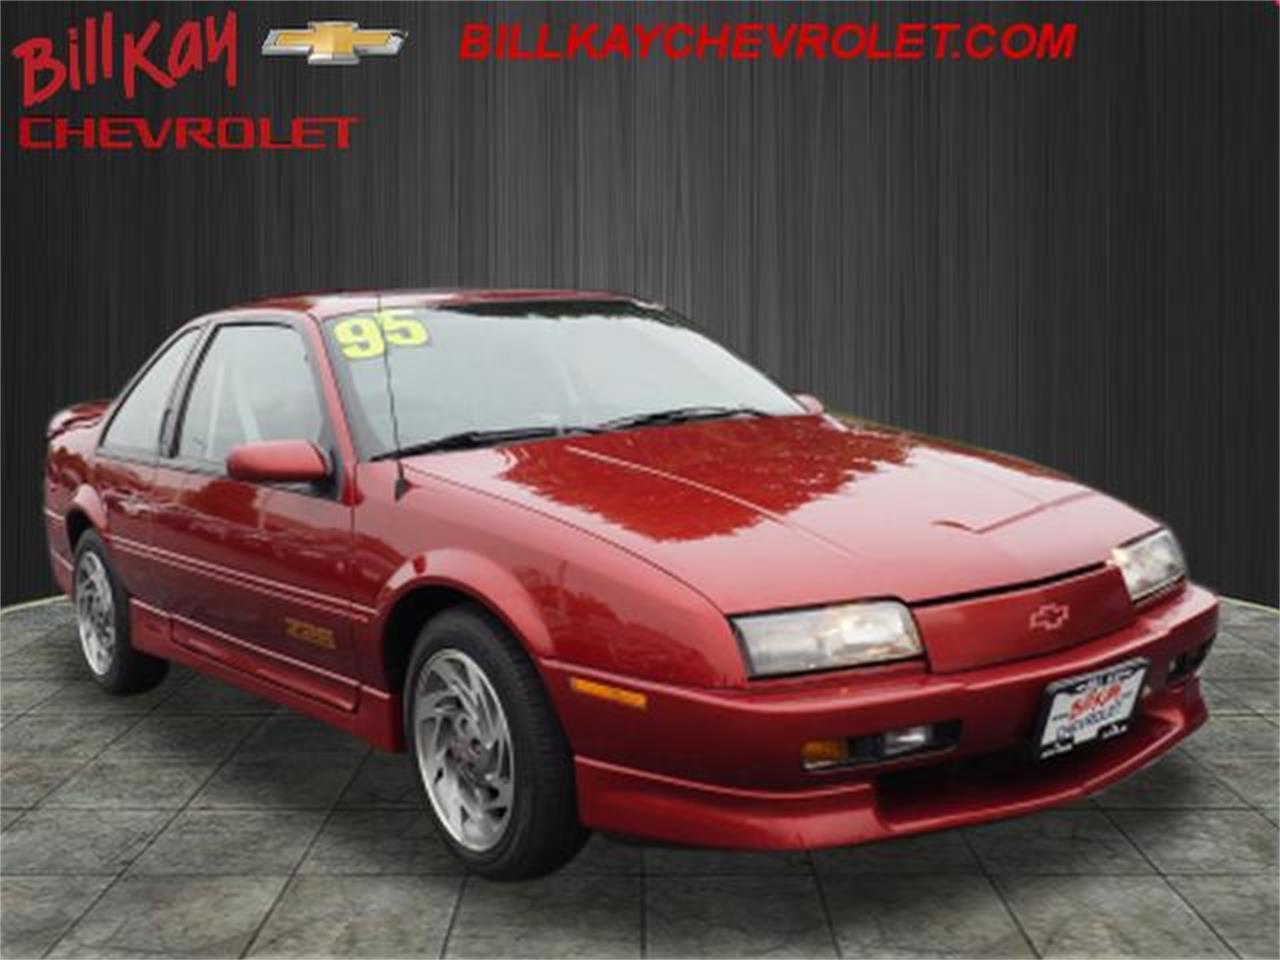 1995 Chevrolet Beretta For Sale Classiccars Com Cc 1227888